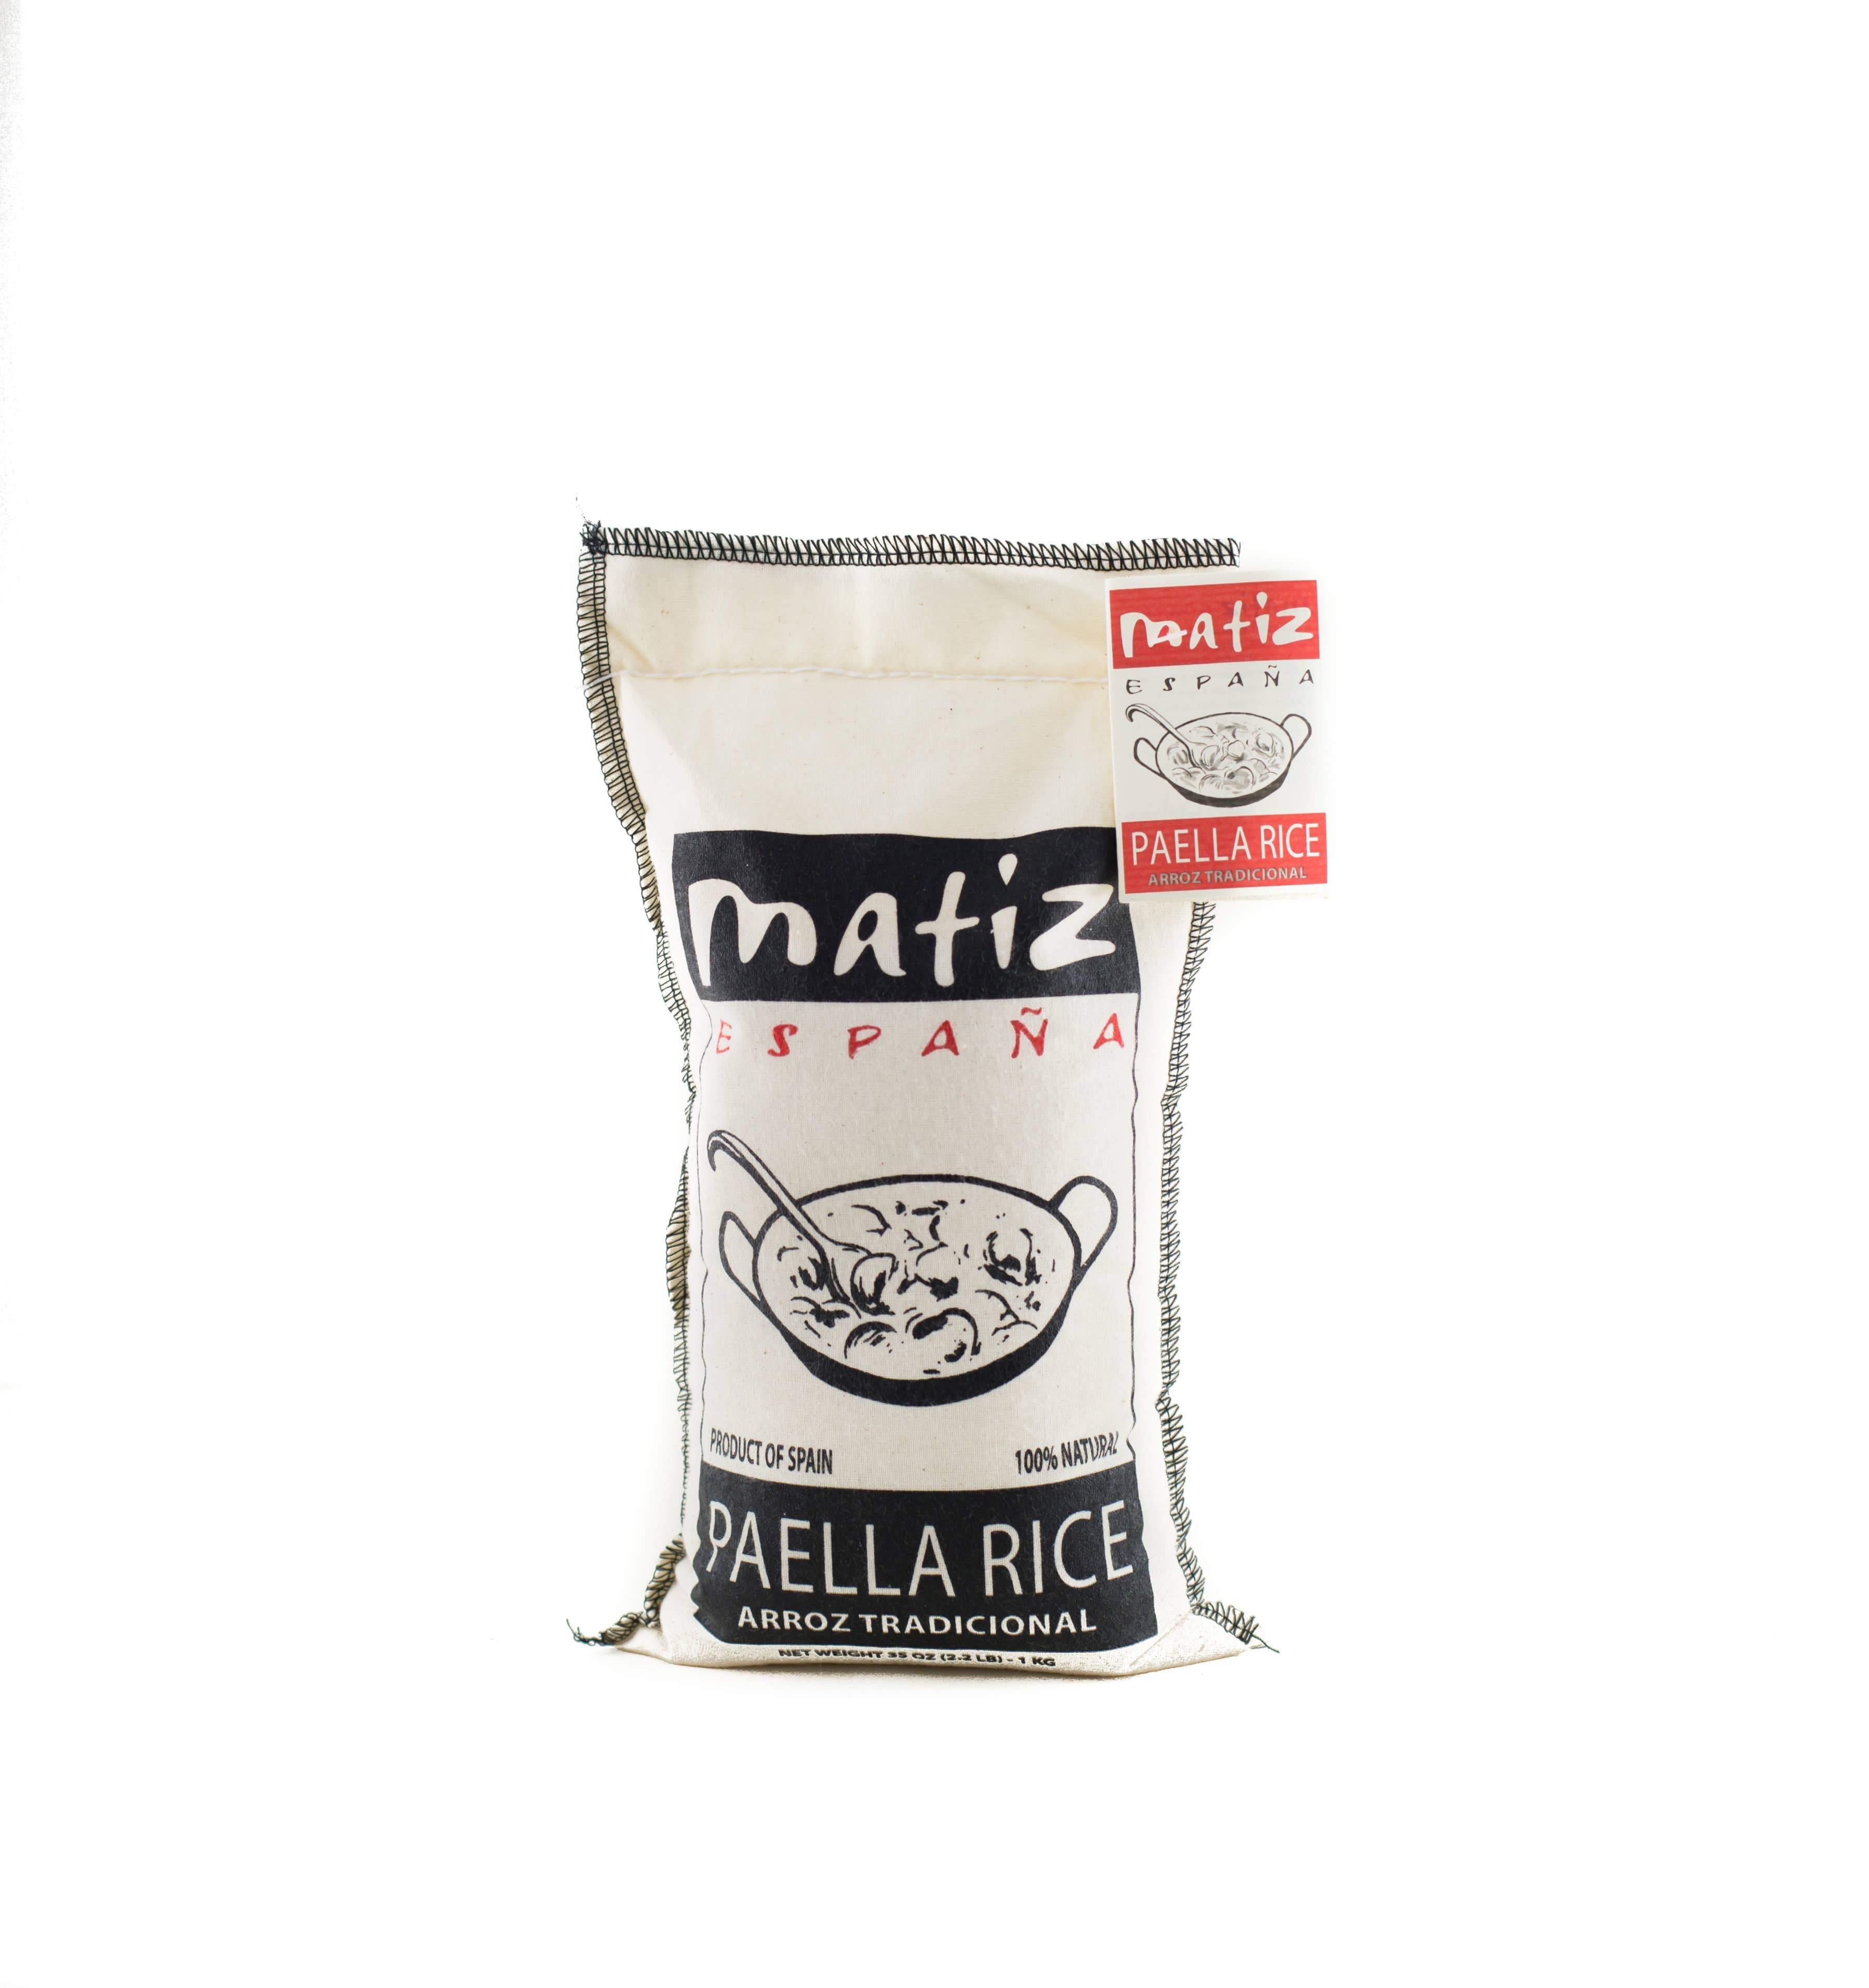 Matiz Paella Rice - 2.2lb